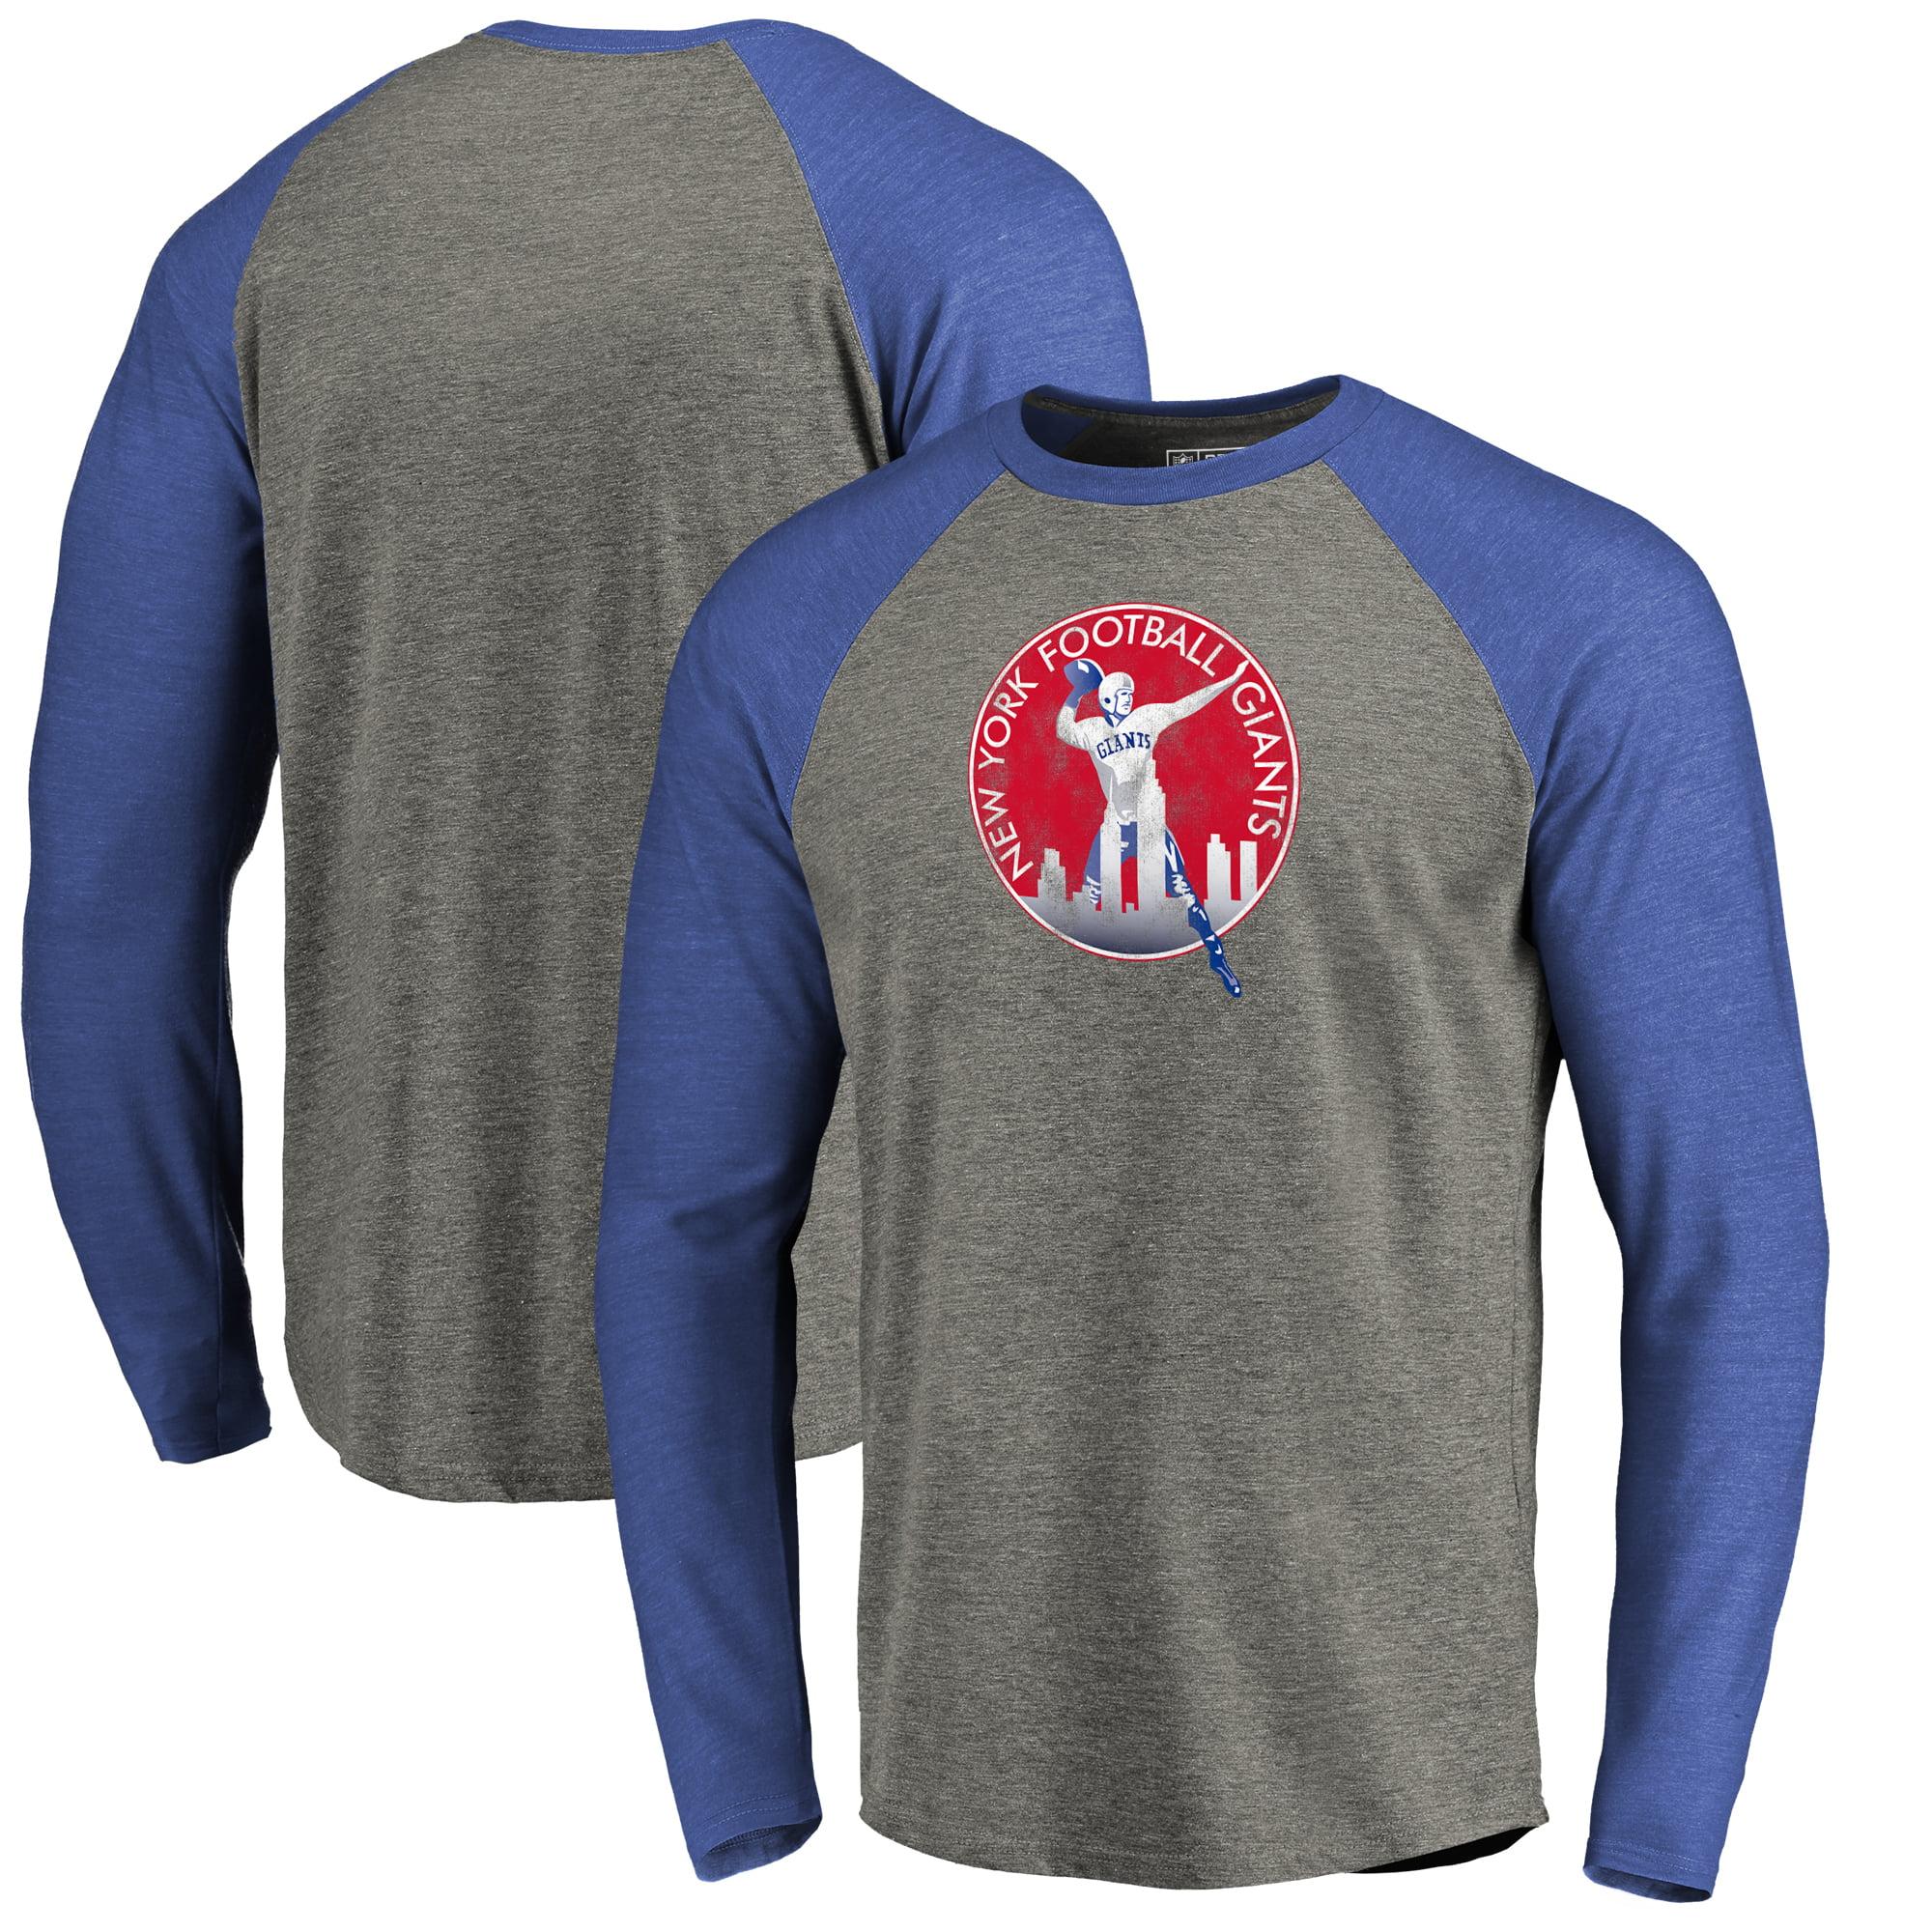 New York Giants NFL Pro Line by Fanatics Branded Throwback Logo Big & Tall Long Sleeve Tri-Blend Raglan T-Shirt - Gray/Royal